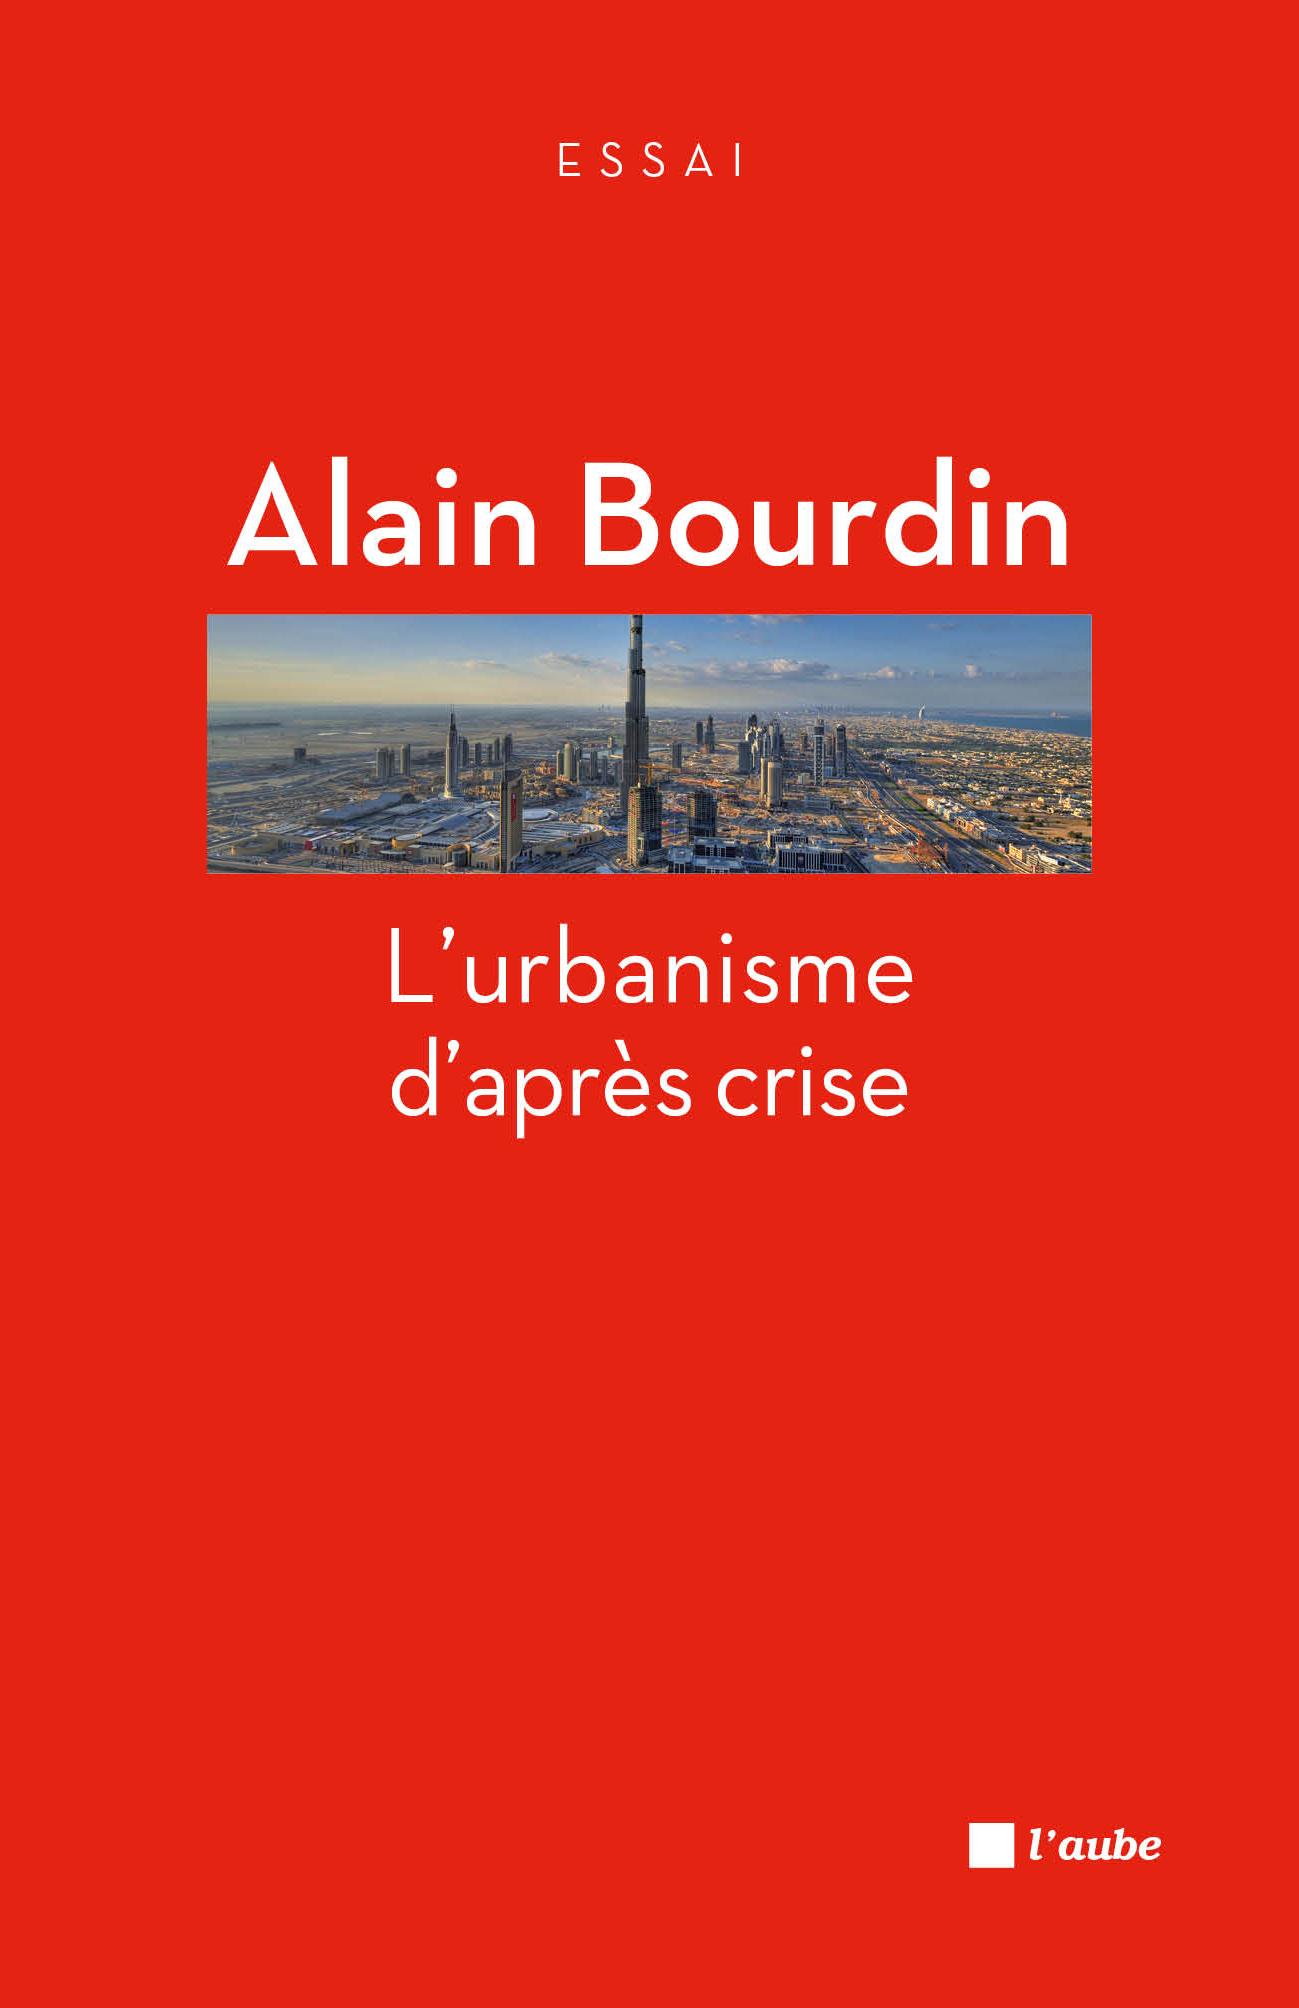 L'urbanisme d'après crise